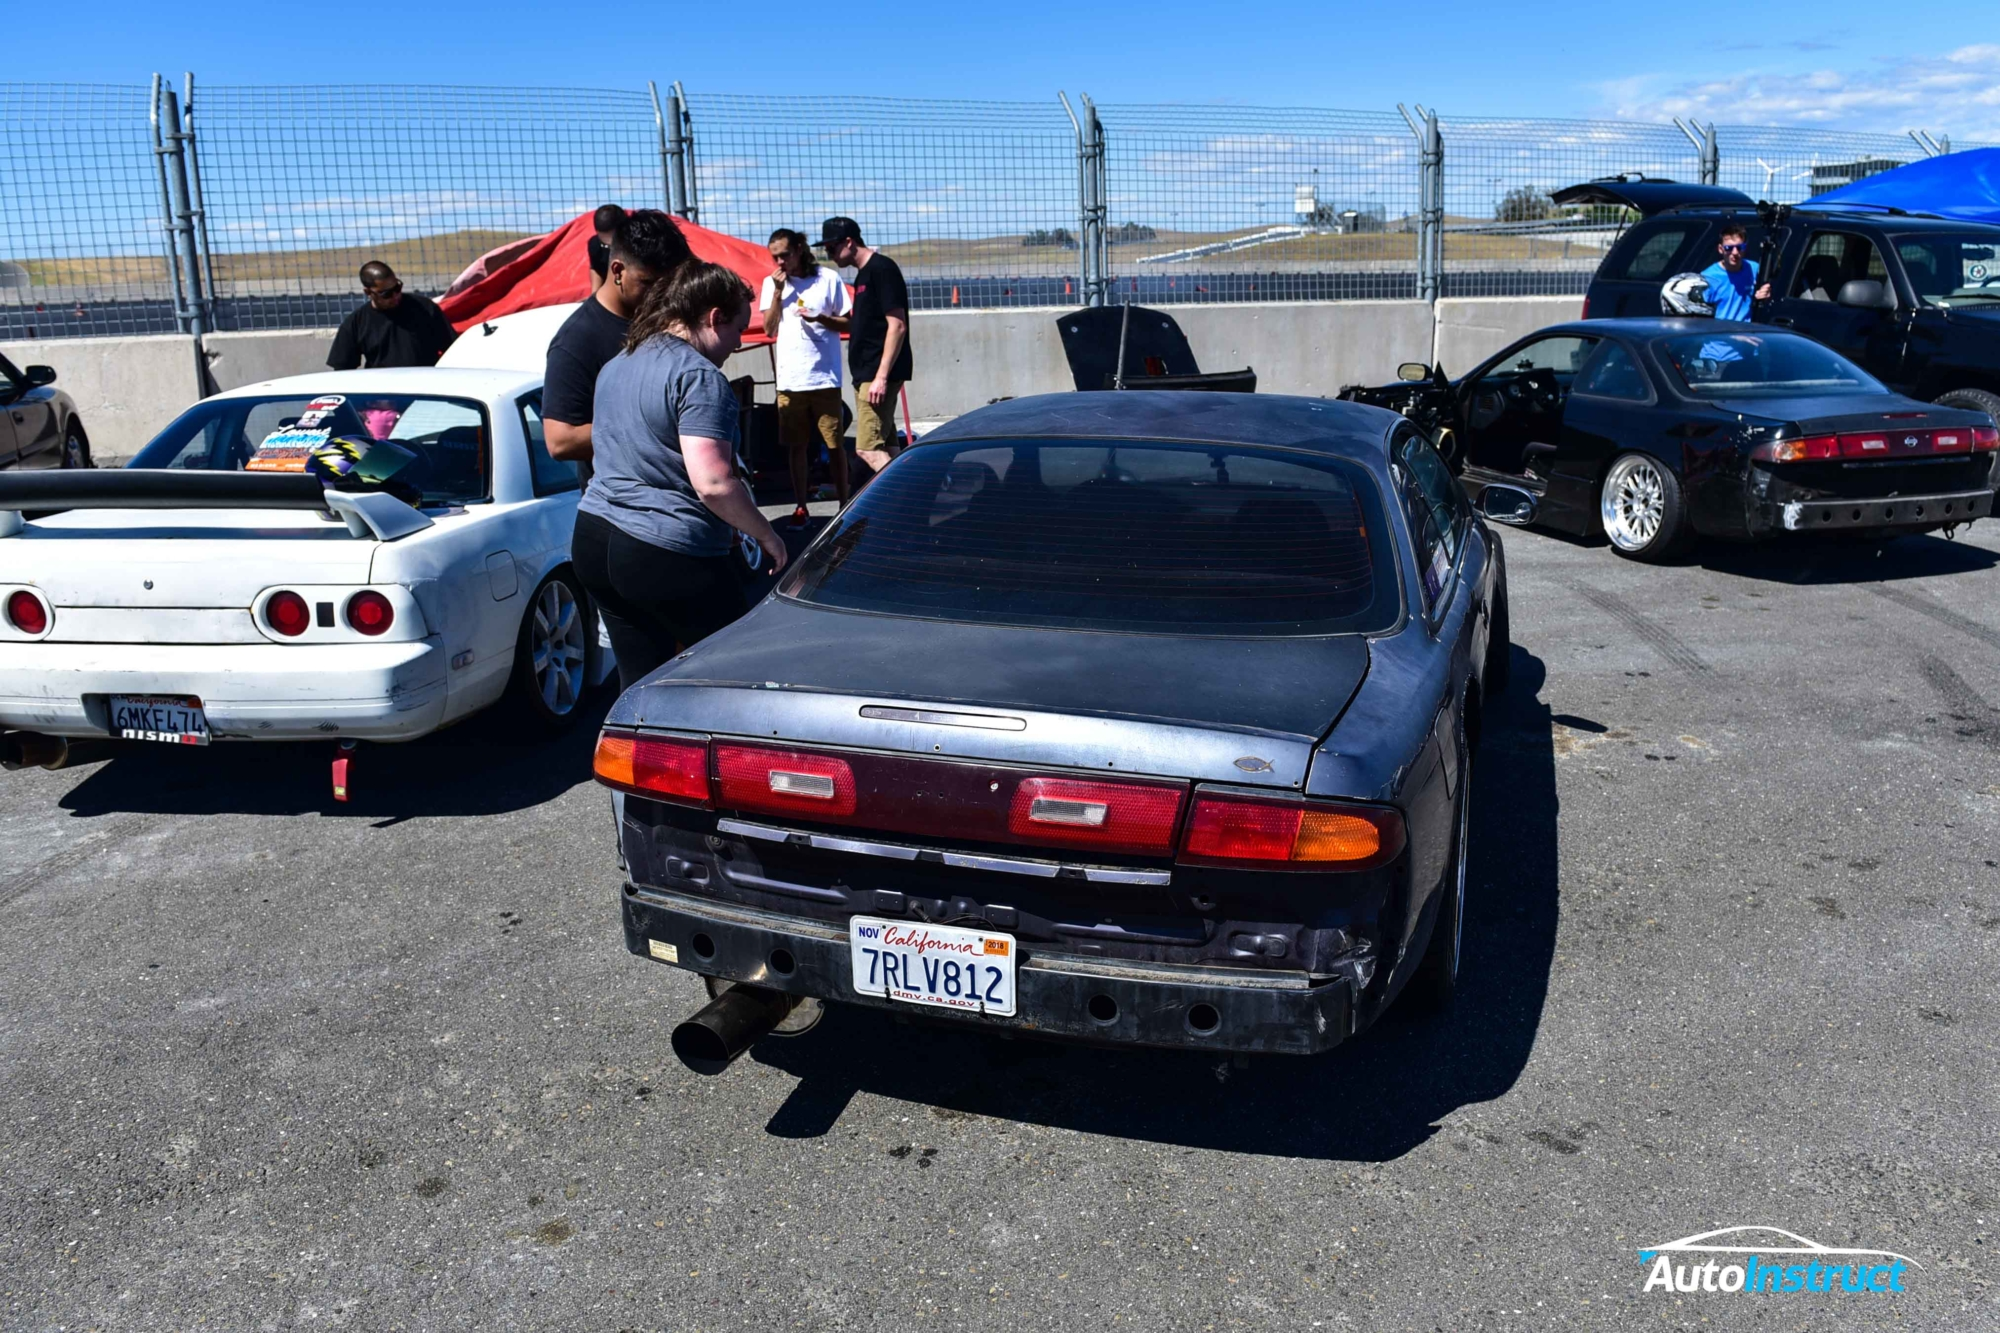 Drifting at Thunderhill Raceway